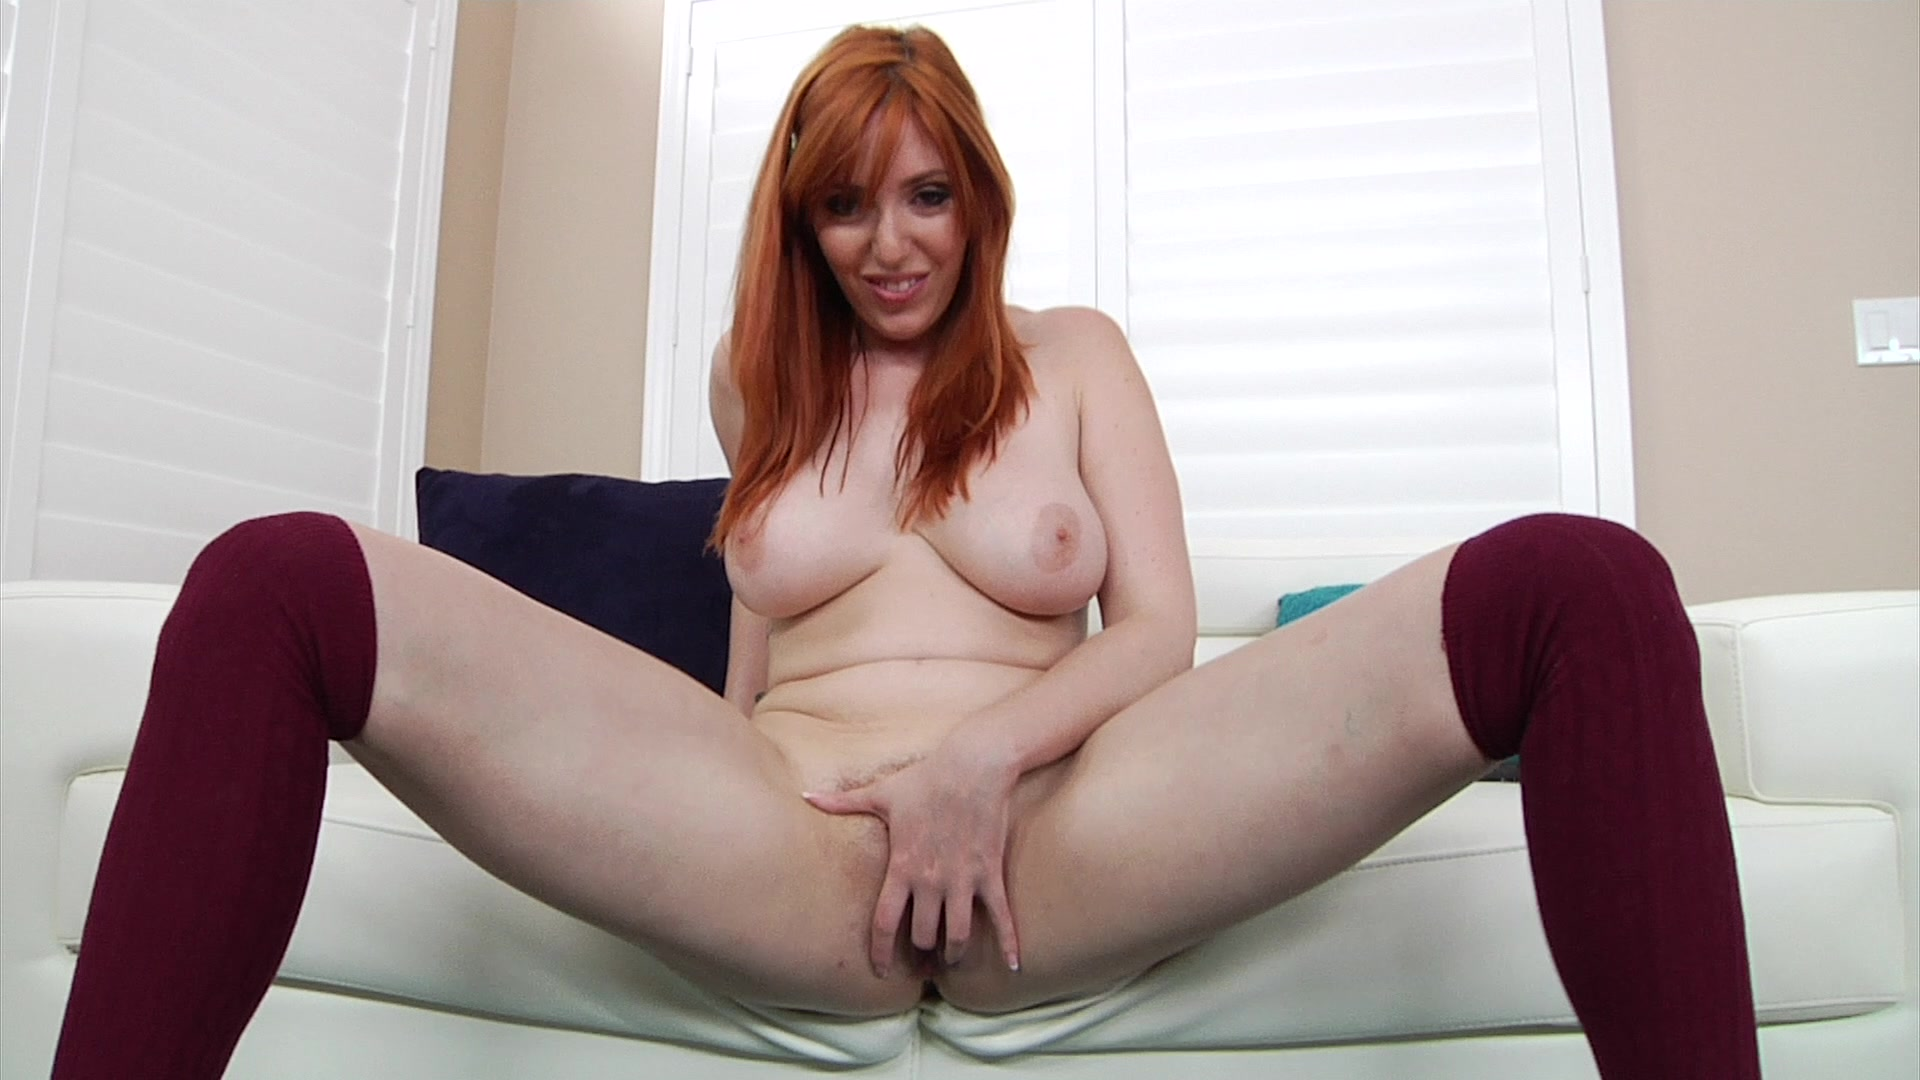 Redhead mature porn picture galleries